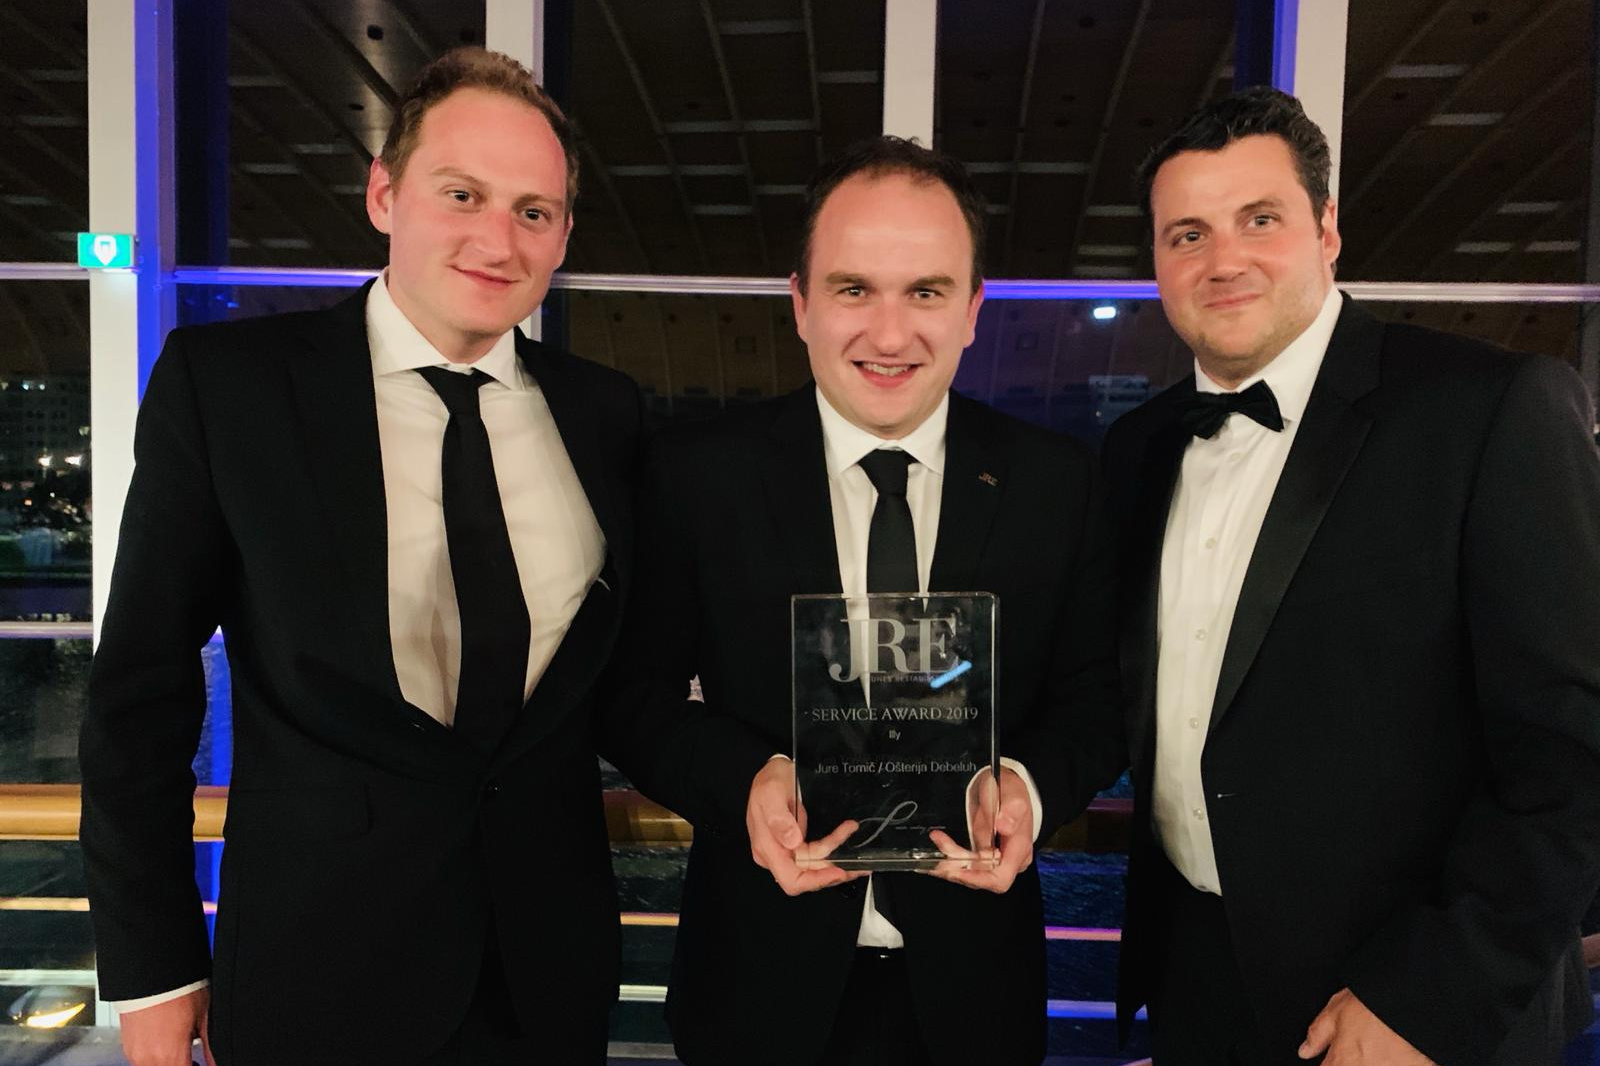 JRE Best Service Award 2019